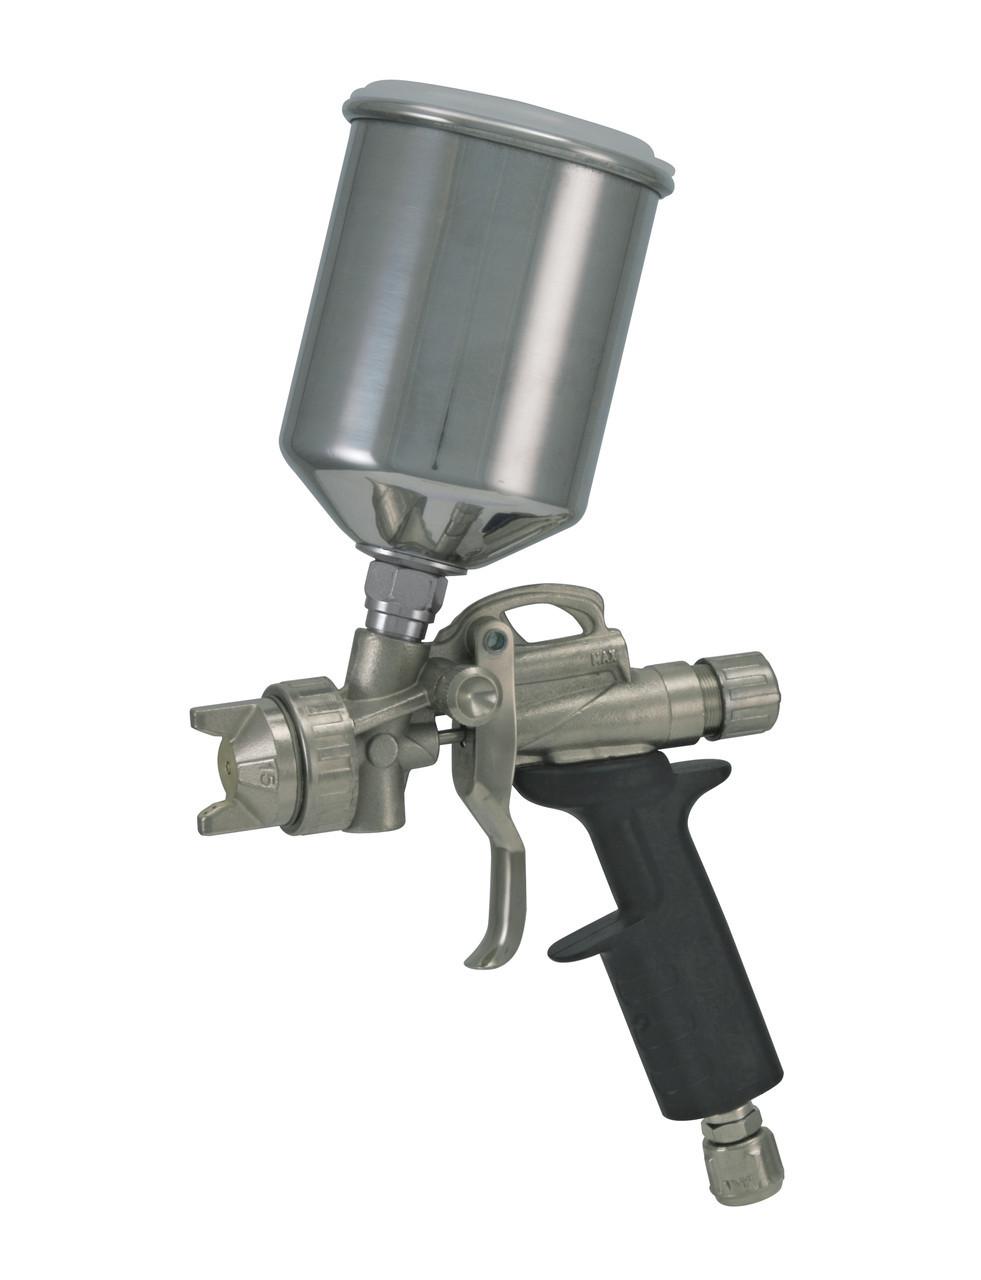 Краскопульт профессиональный RV/S металл бачок 500 мл дюза-1,2 мм